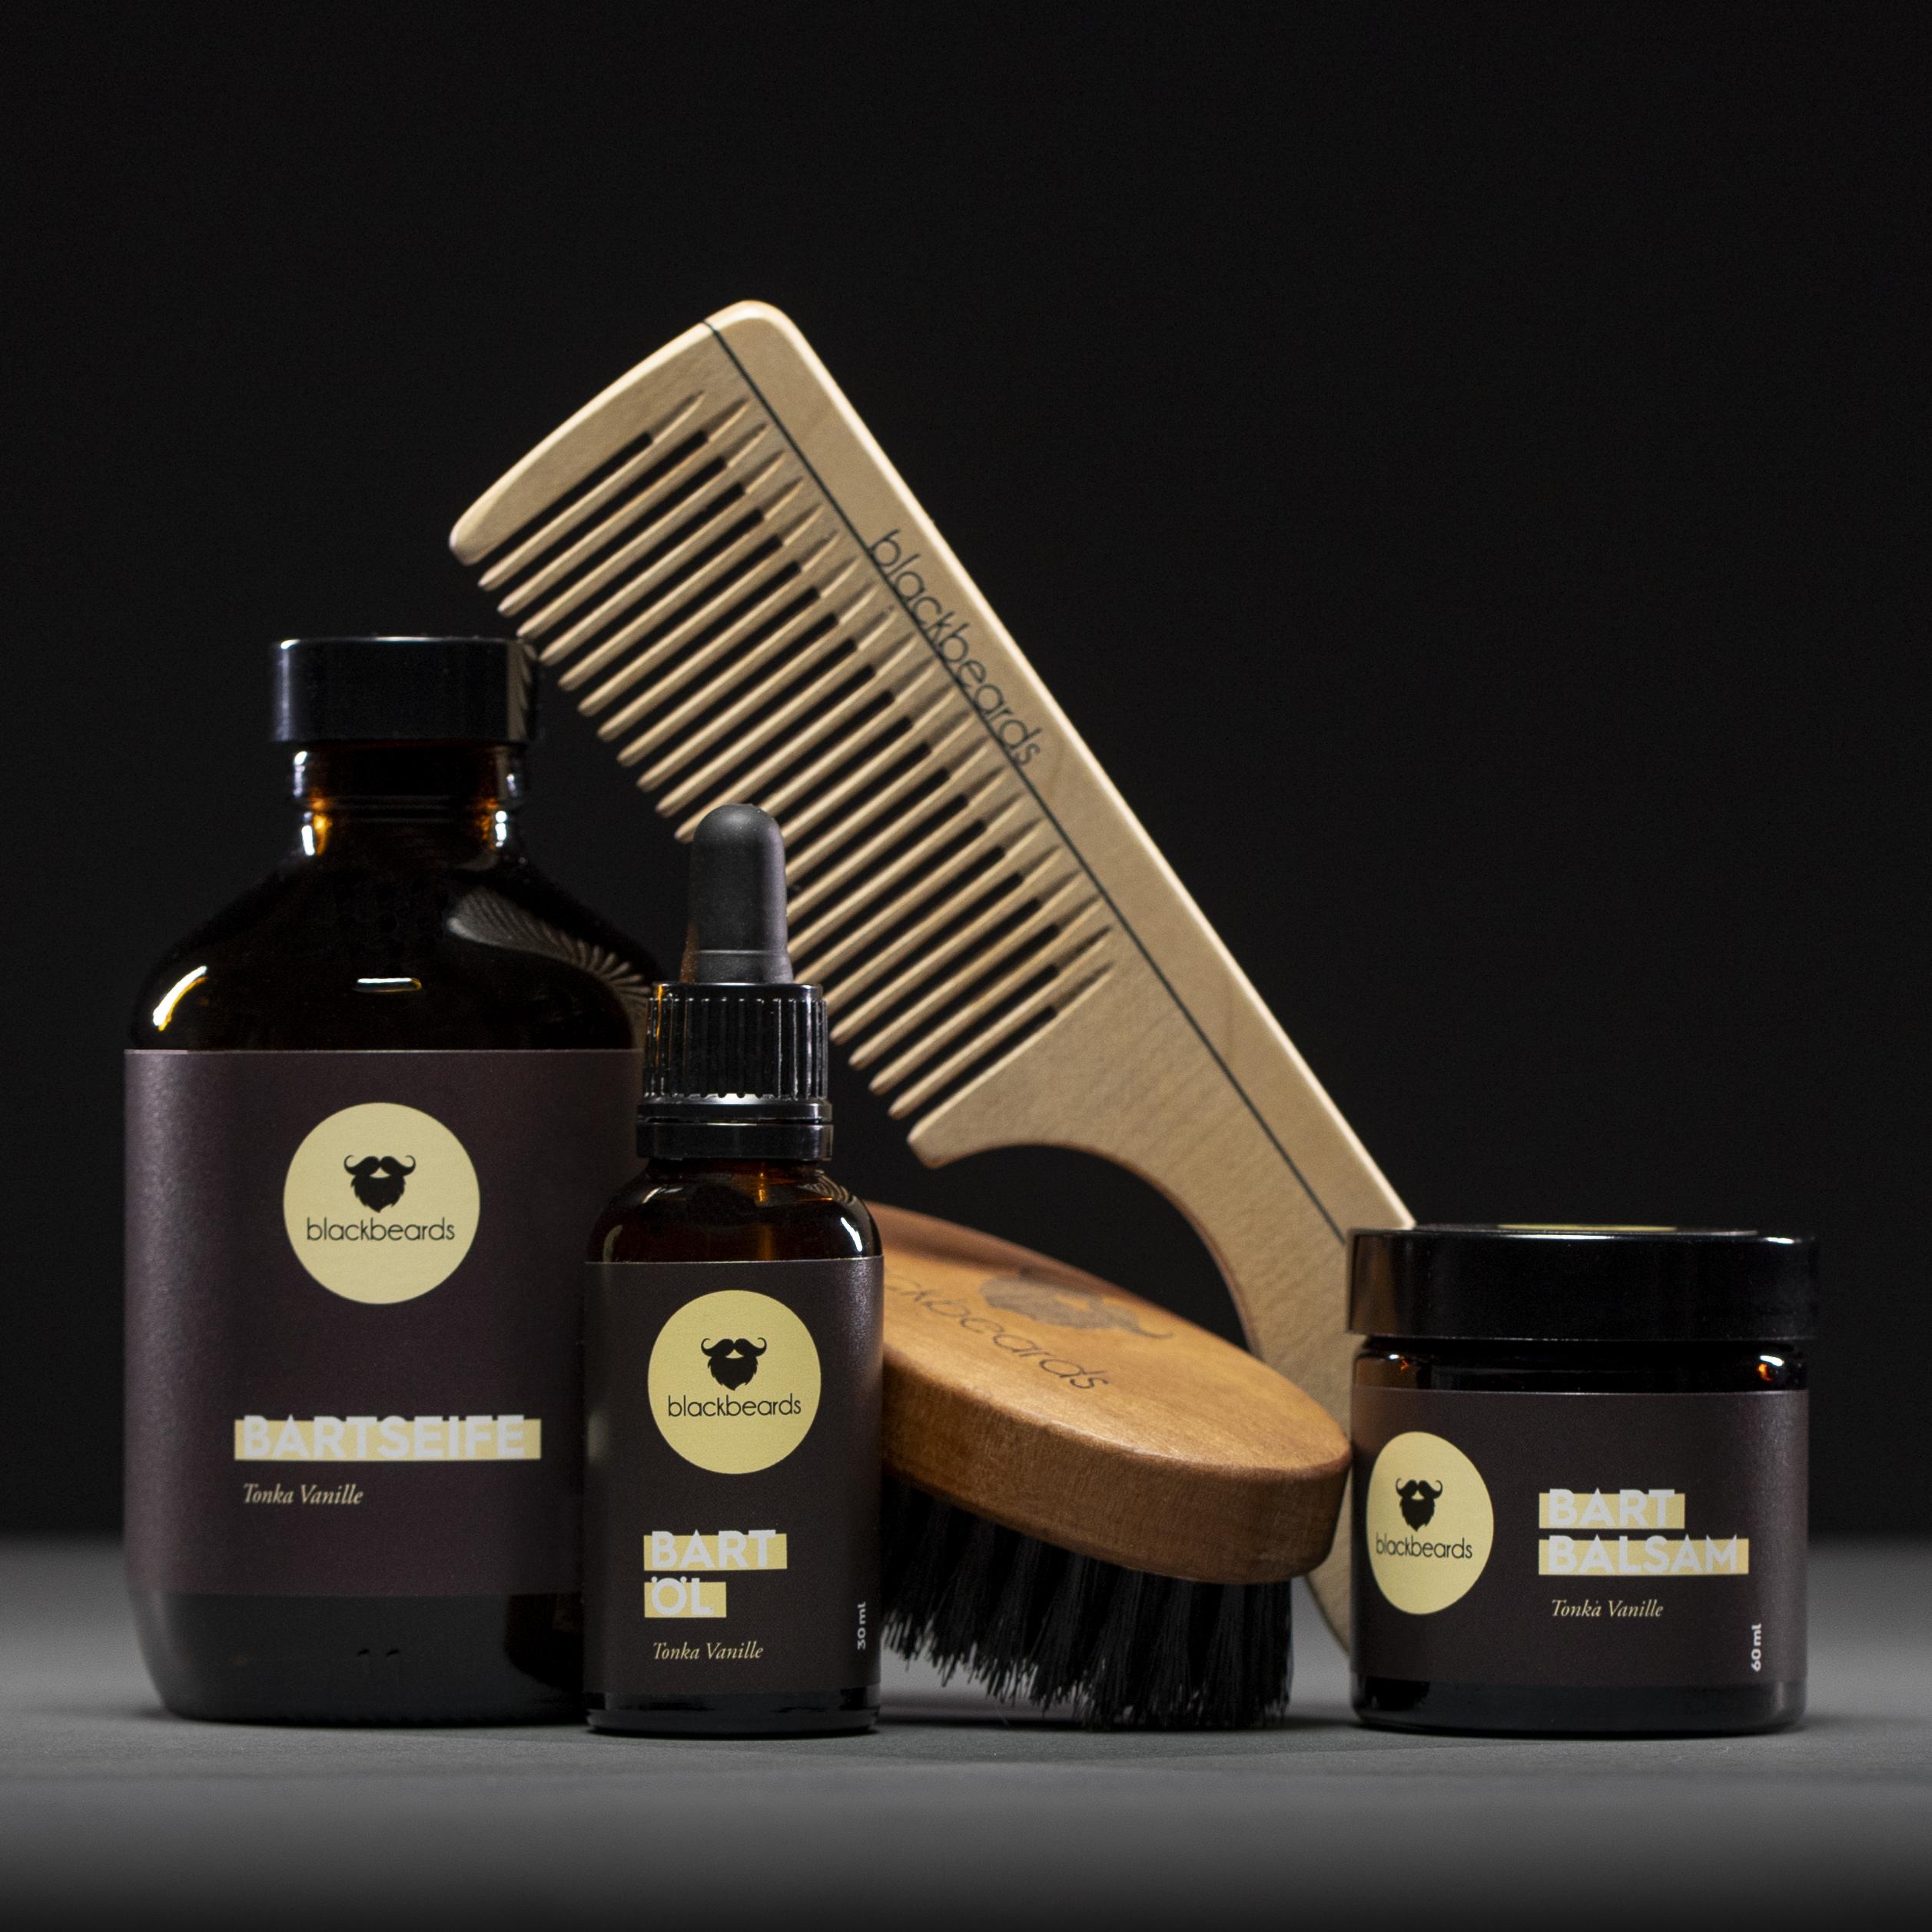 blackbeards Bartpflege Set Deluxe im Sale.